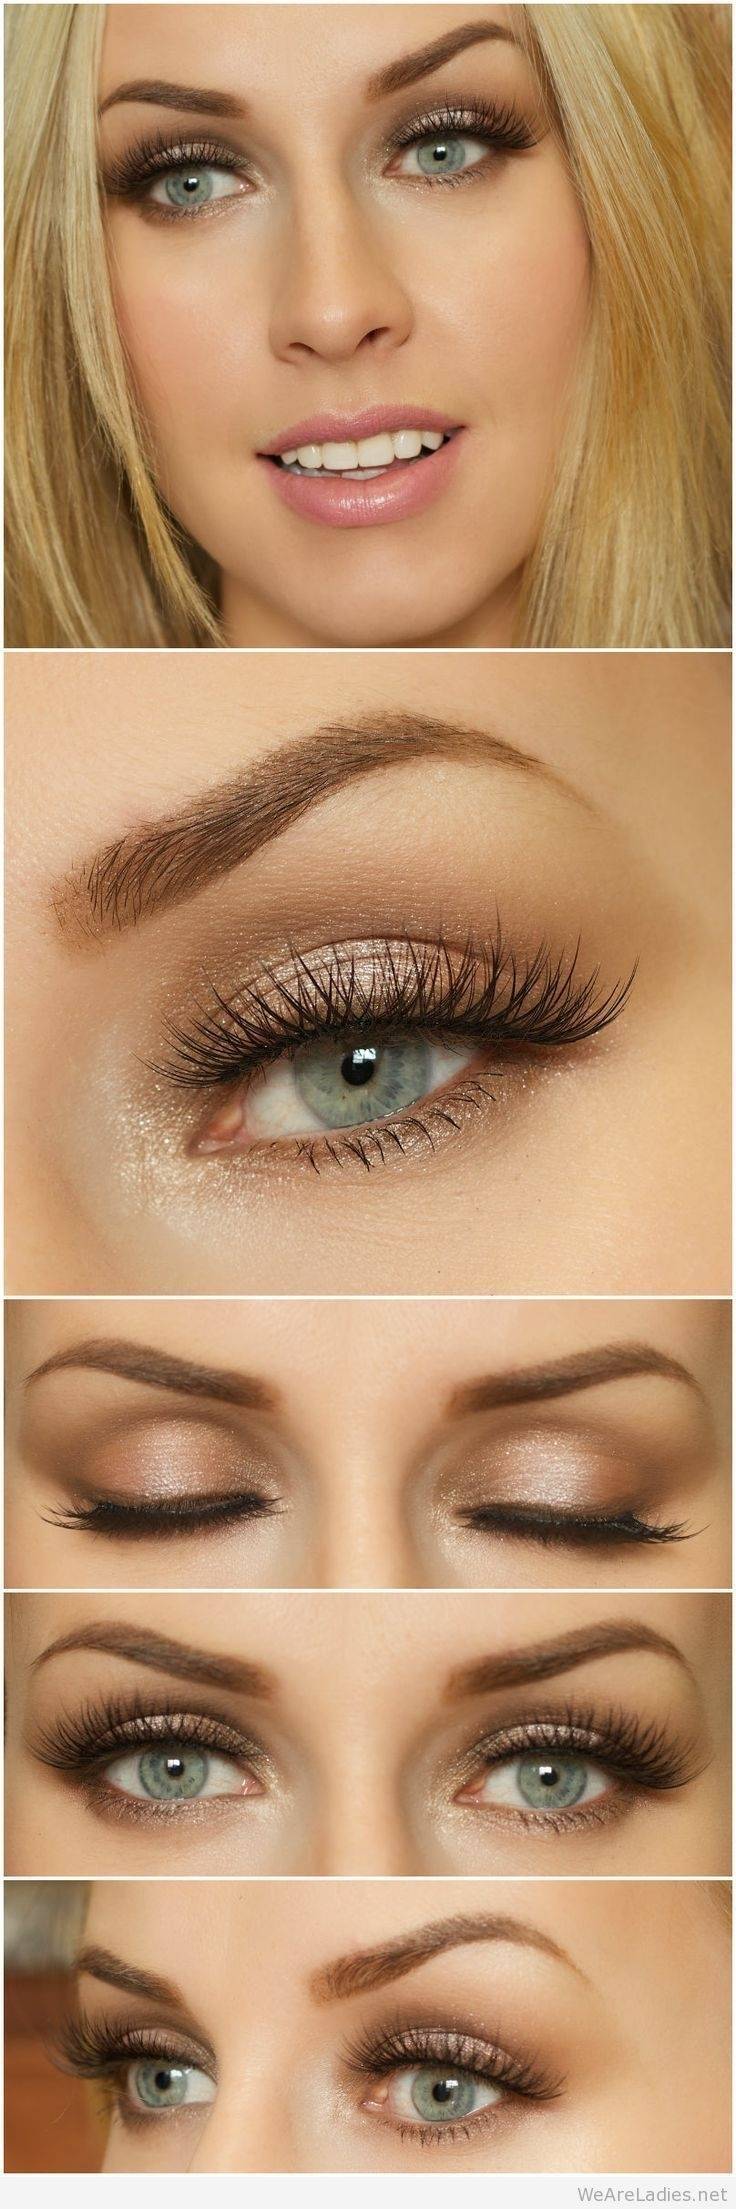 Brown Eye Makeup For Blue Eyes And Blonde Hair | Wedding inside How To Do Makeup For Blue Eyes And Blonde Hair